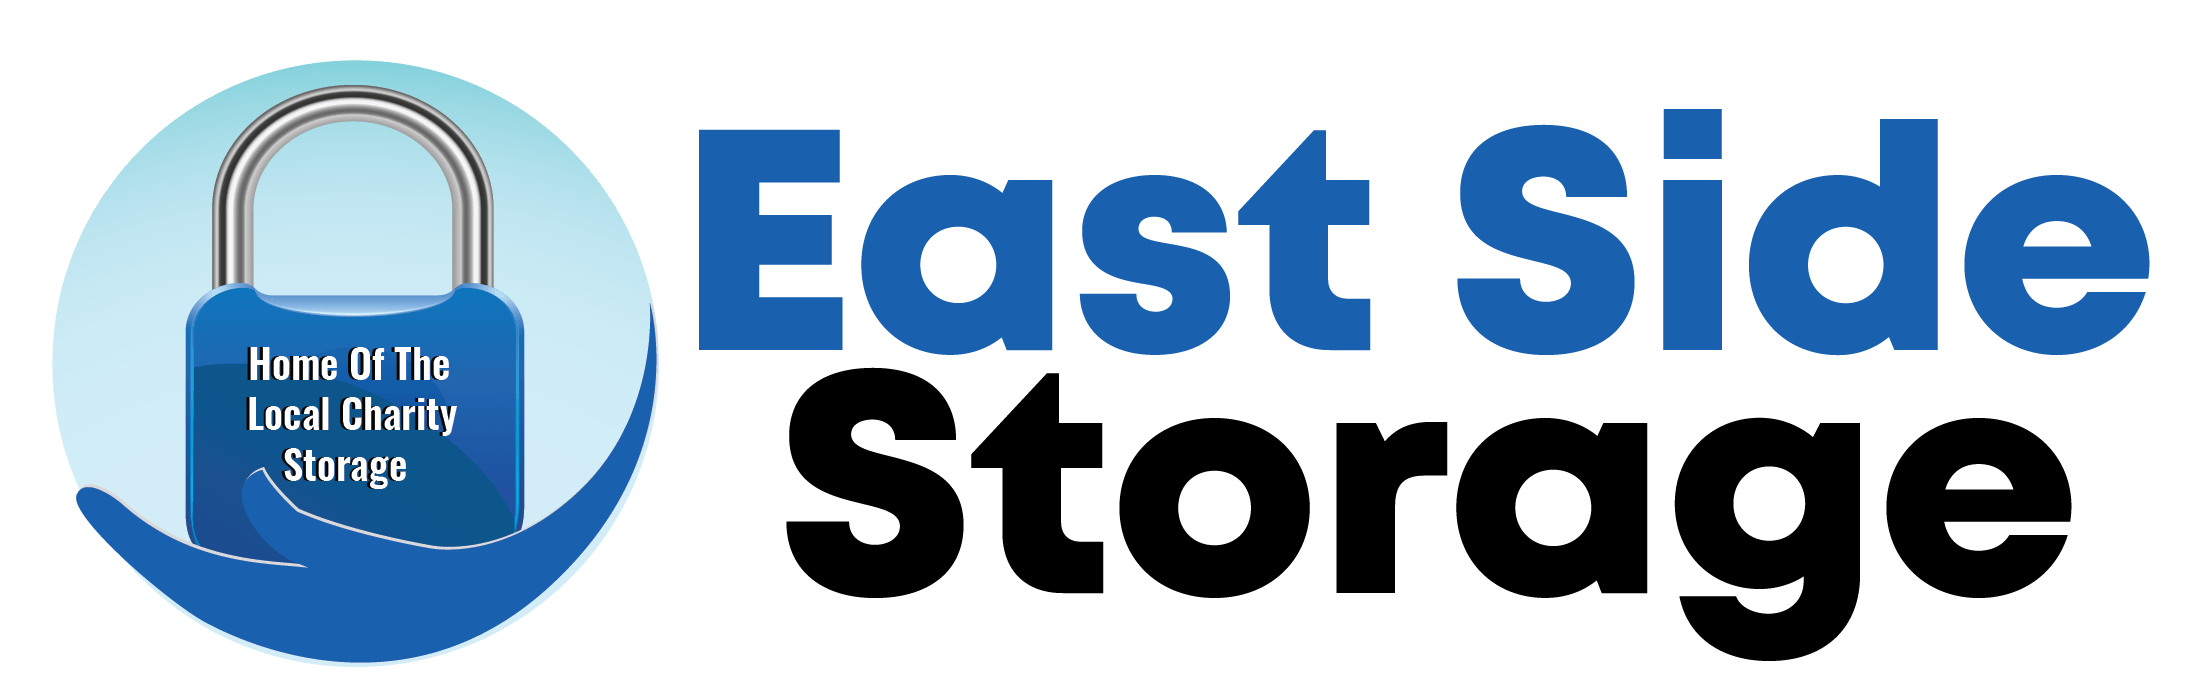 East Side Storage